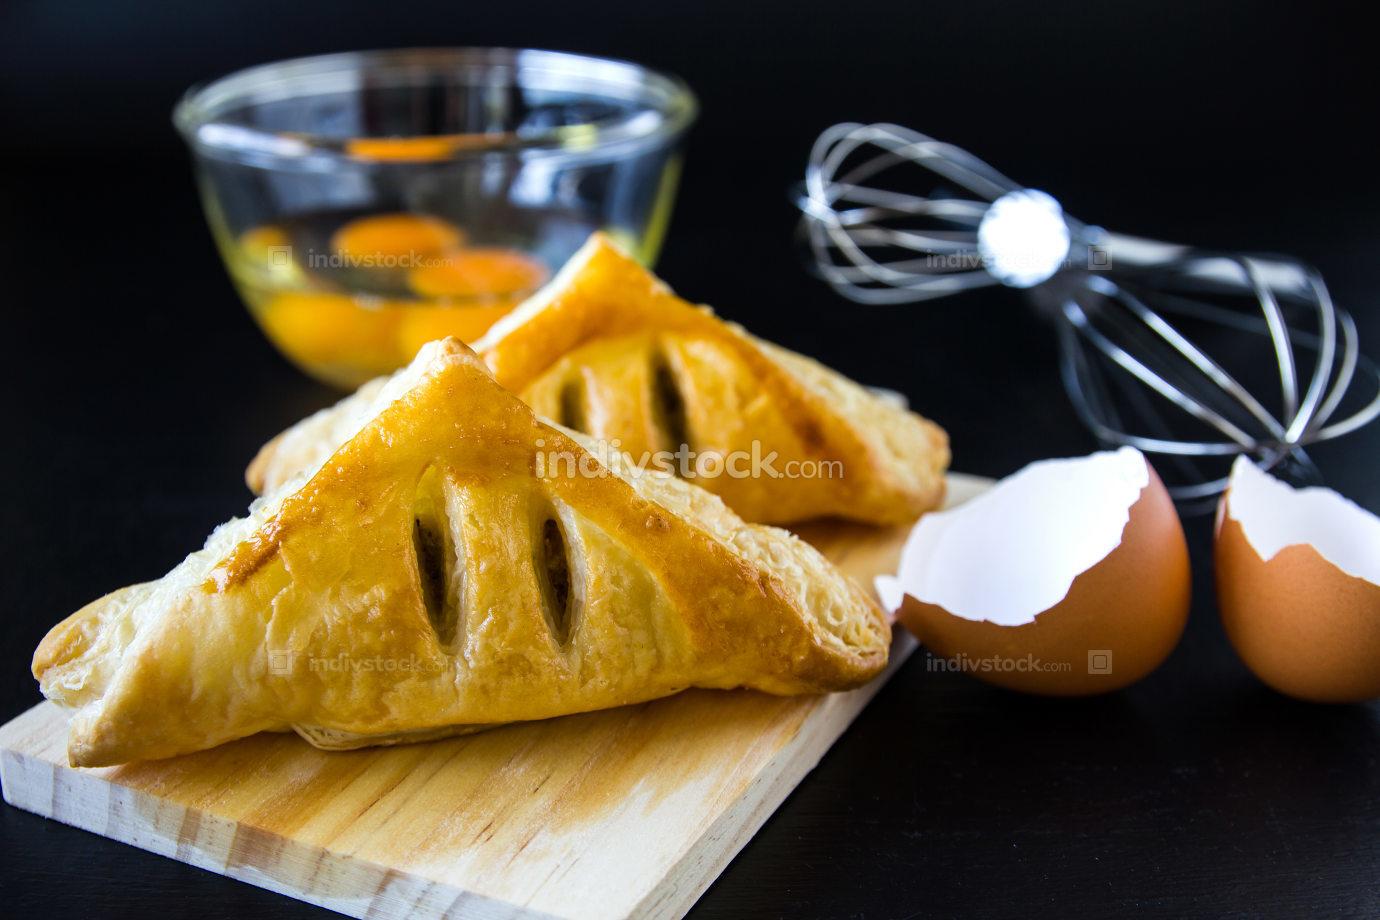 Homemade breads or bun on wood background,  breakfast food